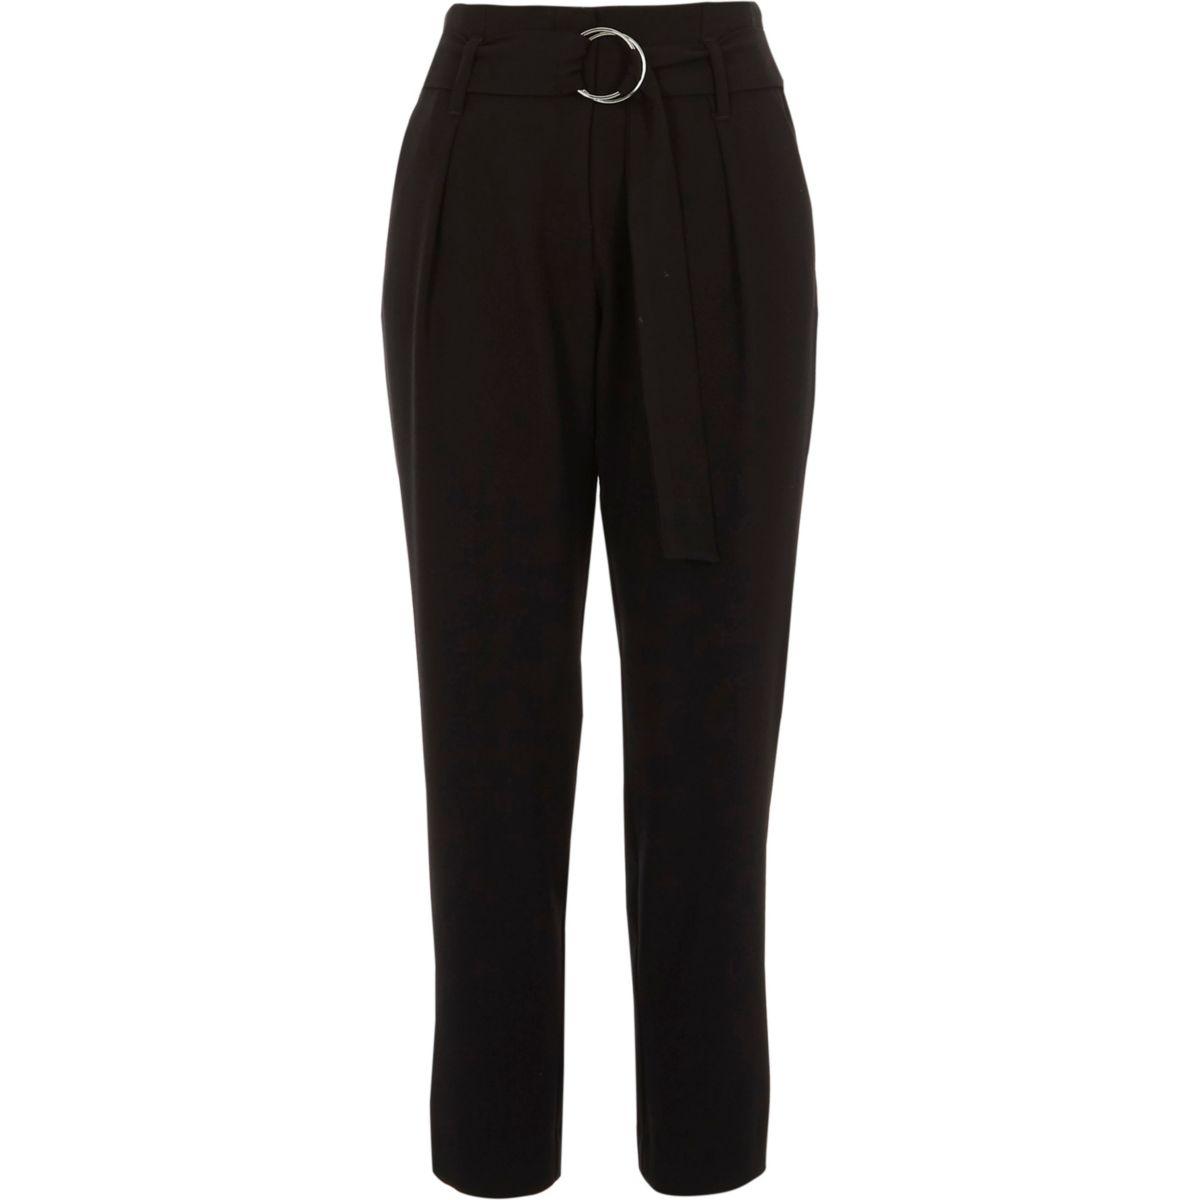 Zwarte smaltoelopende broek met strikceintuur met ring